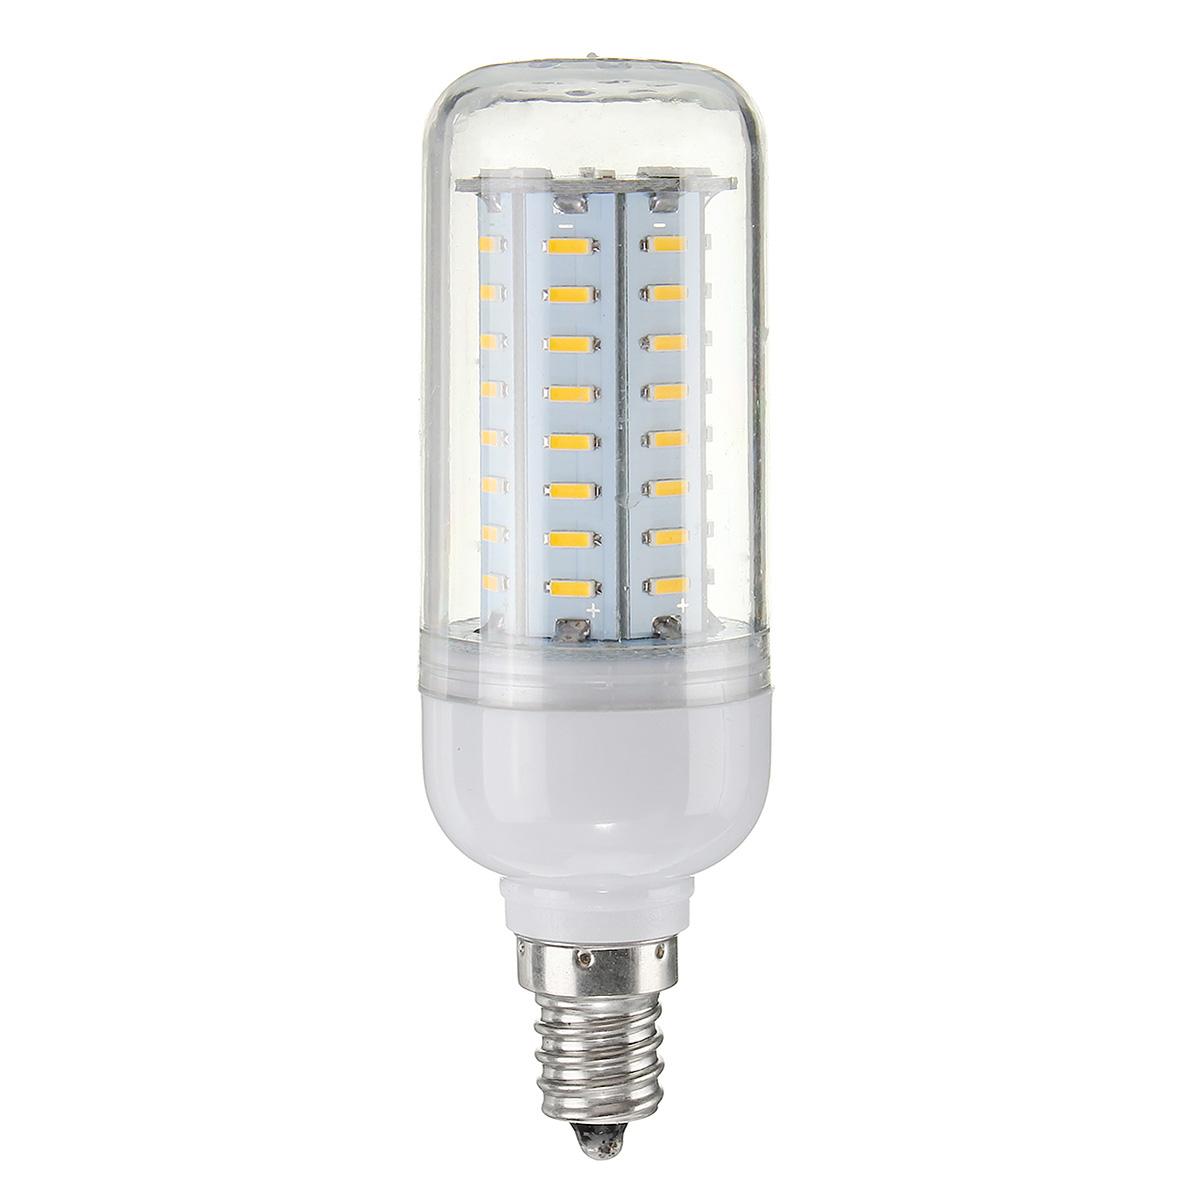 E27 E14 B22 G9 GU10 LED Lights Lamp 4014SMD Corn Energysaving Bulb 12-35W 220V